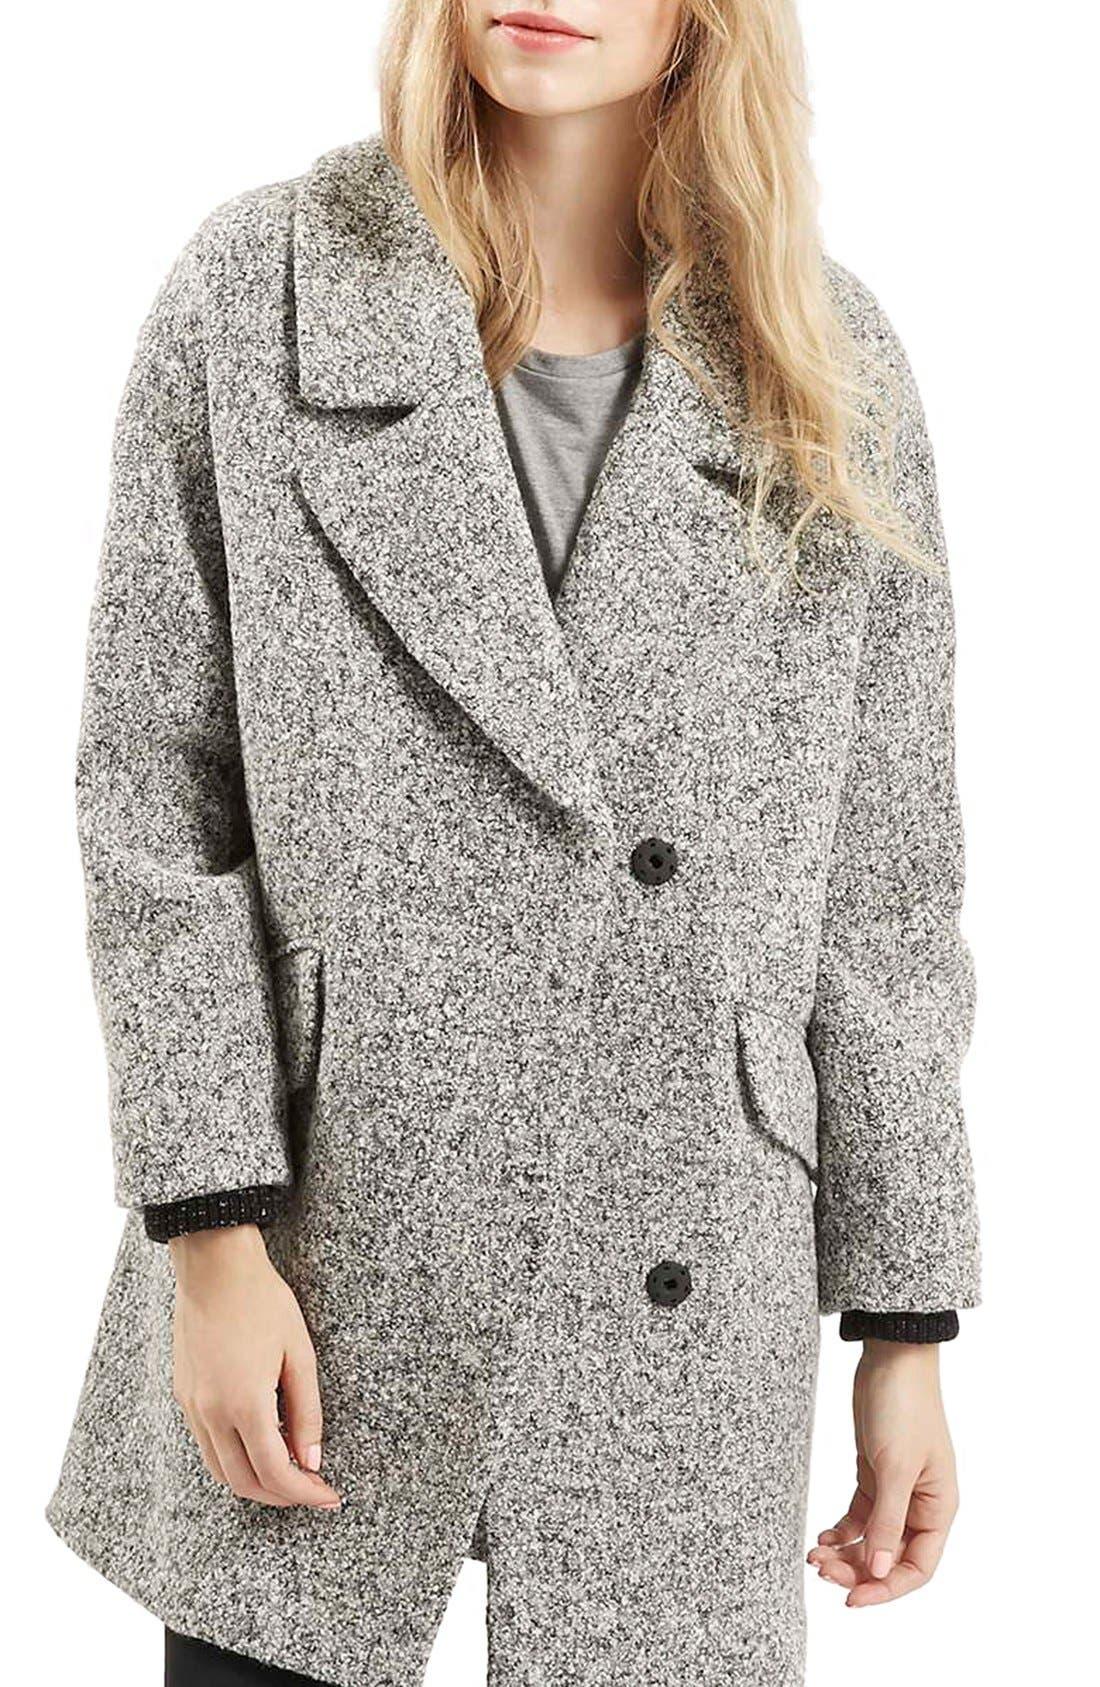 TOPSHOP, 'Amelia' Slouch Coat, Main thumbnail 1, color, 020